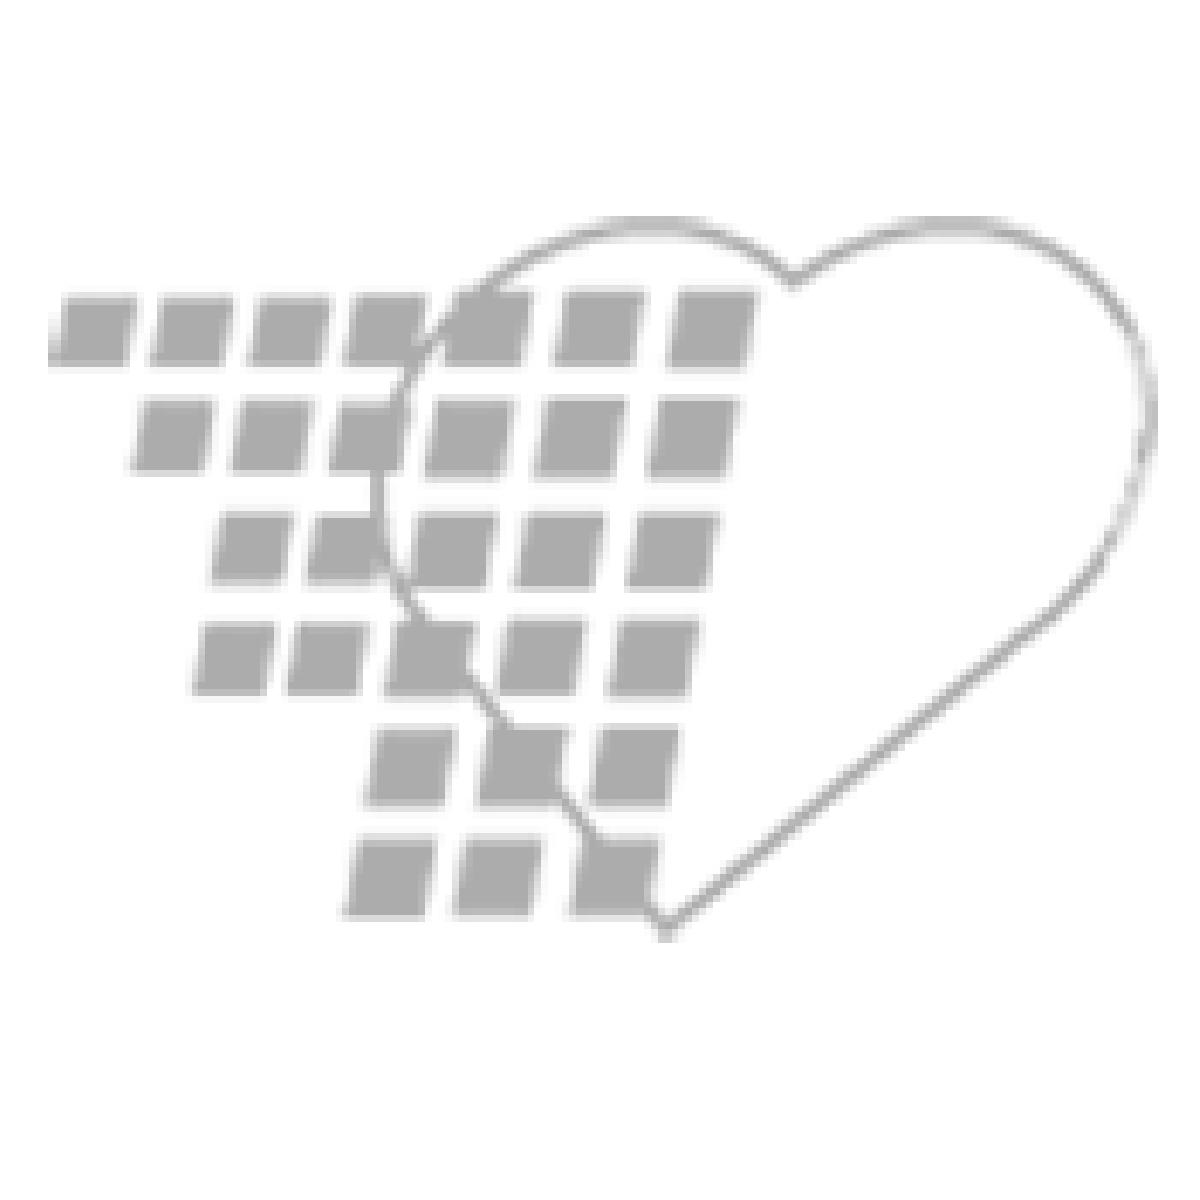 05-84-0484 Medline Interblend Percale Contour Sheet 36x84x9 Inch White